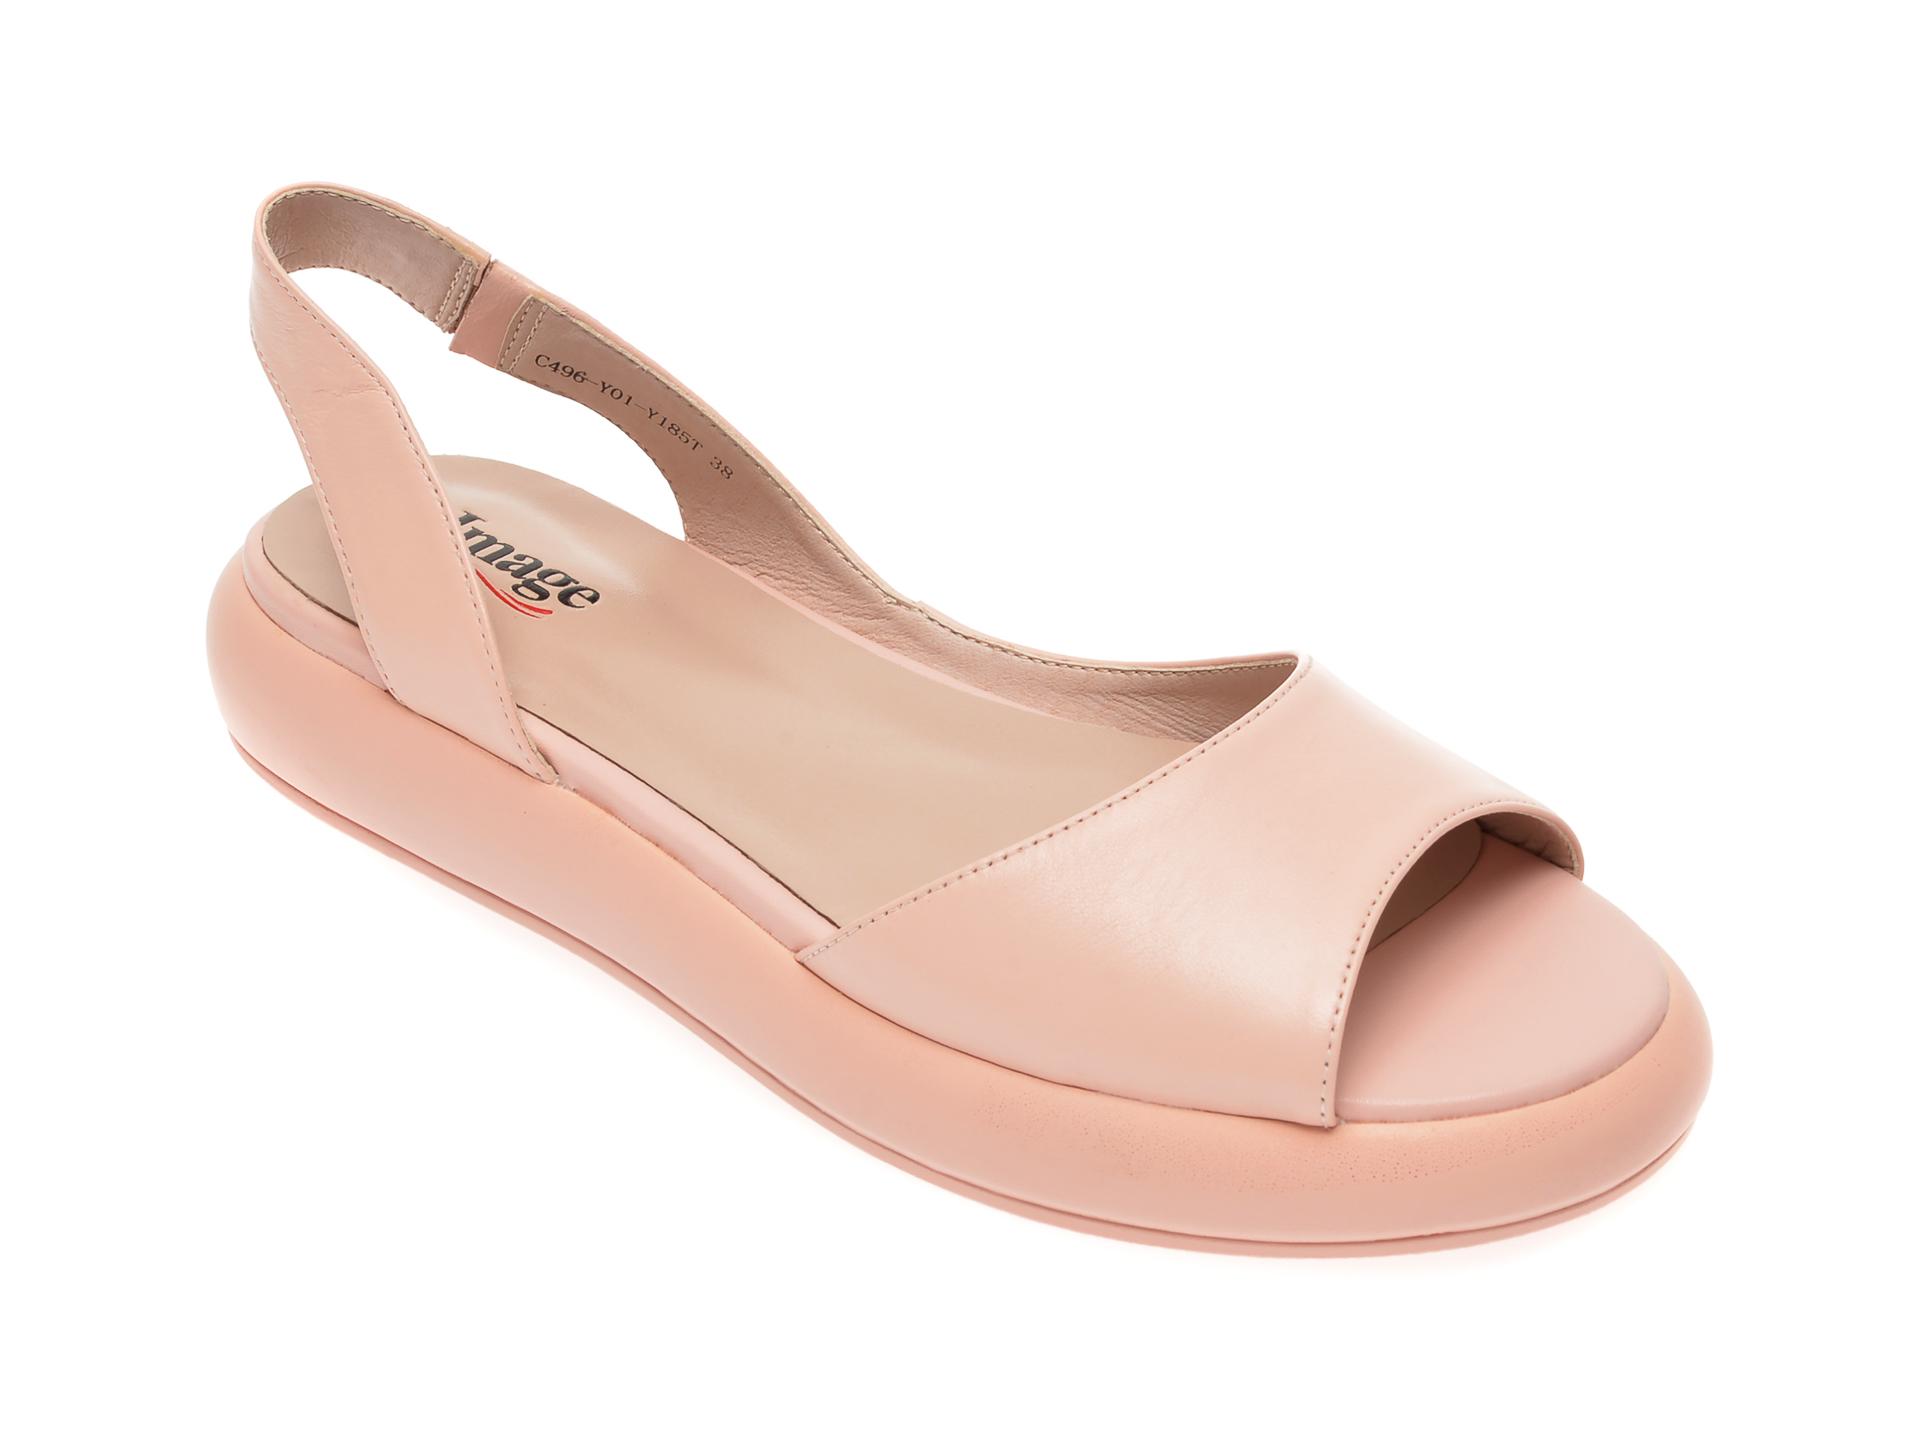 Sandale IMAGE roz, C496Y01, din piele naturala imagine